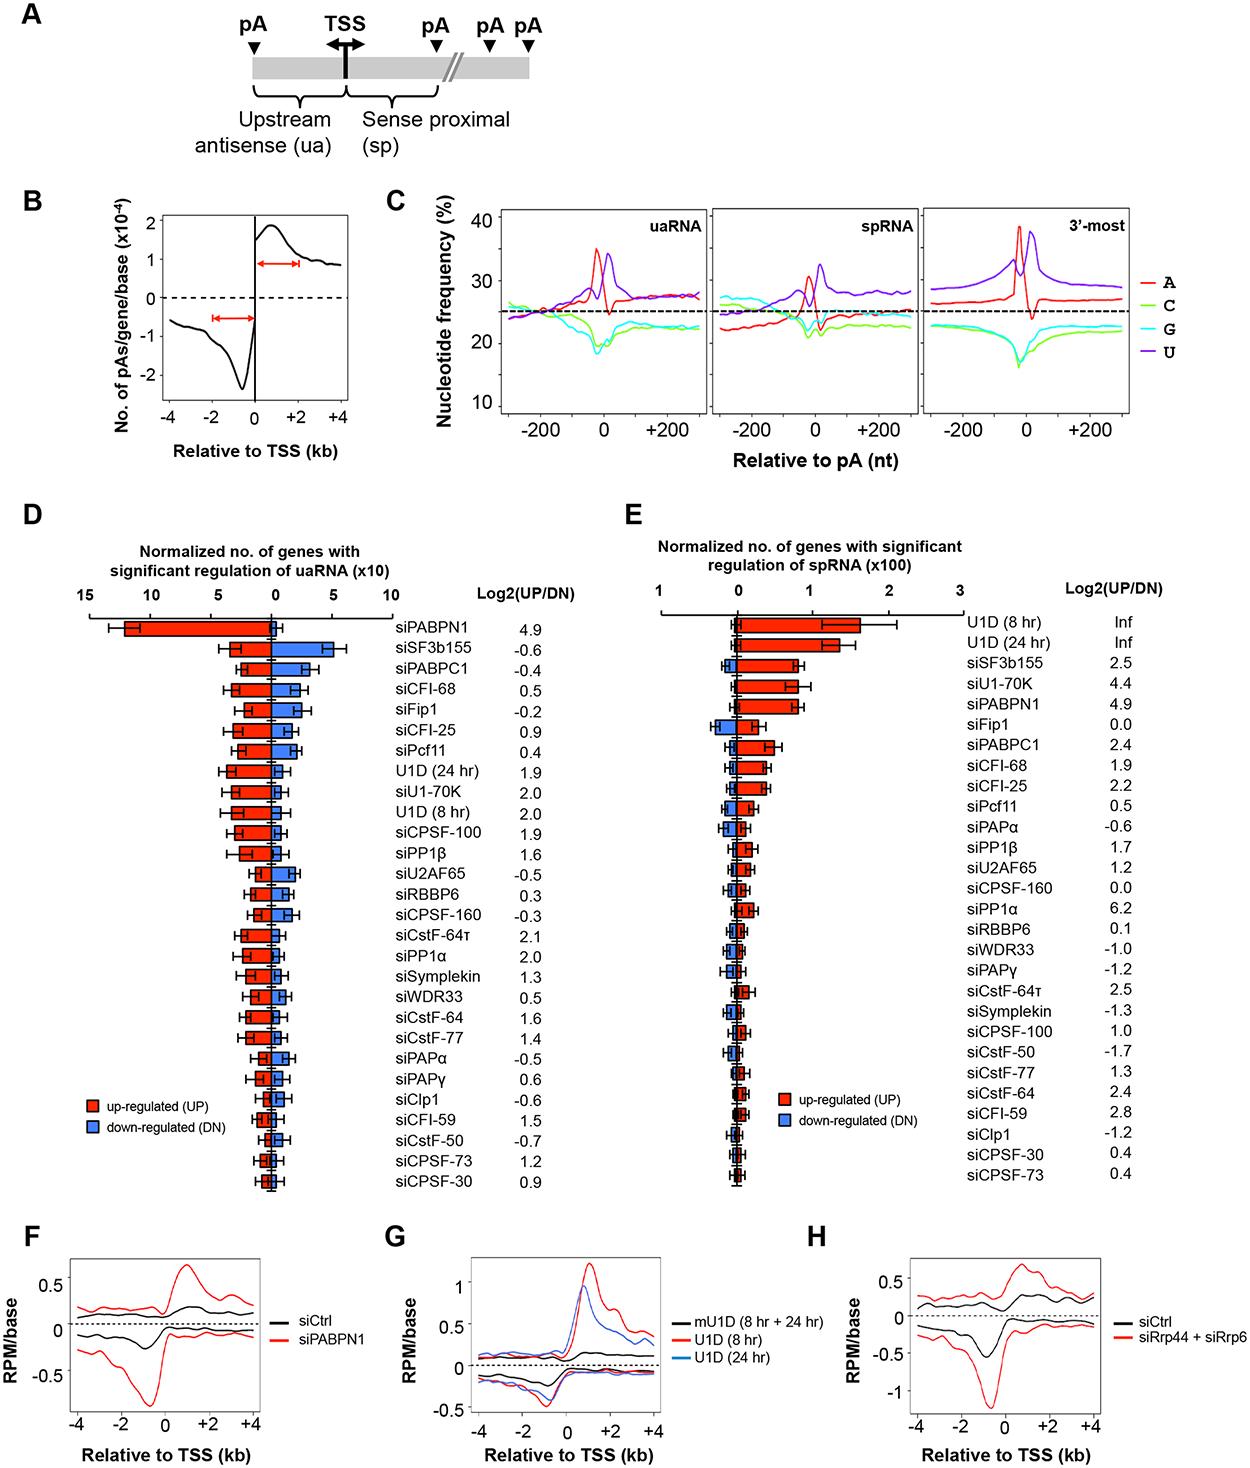 C/P events around the transcriptional start site (TSS).